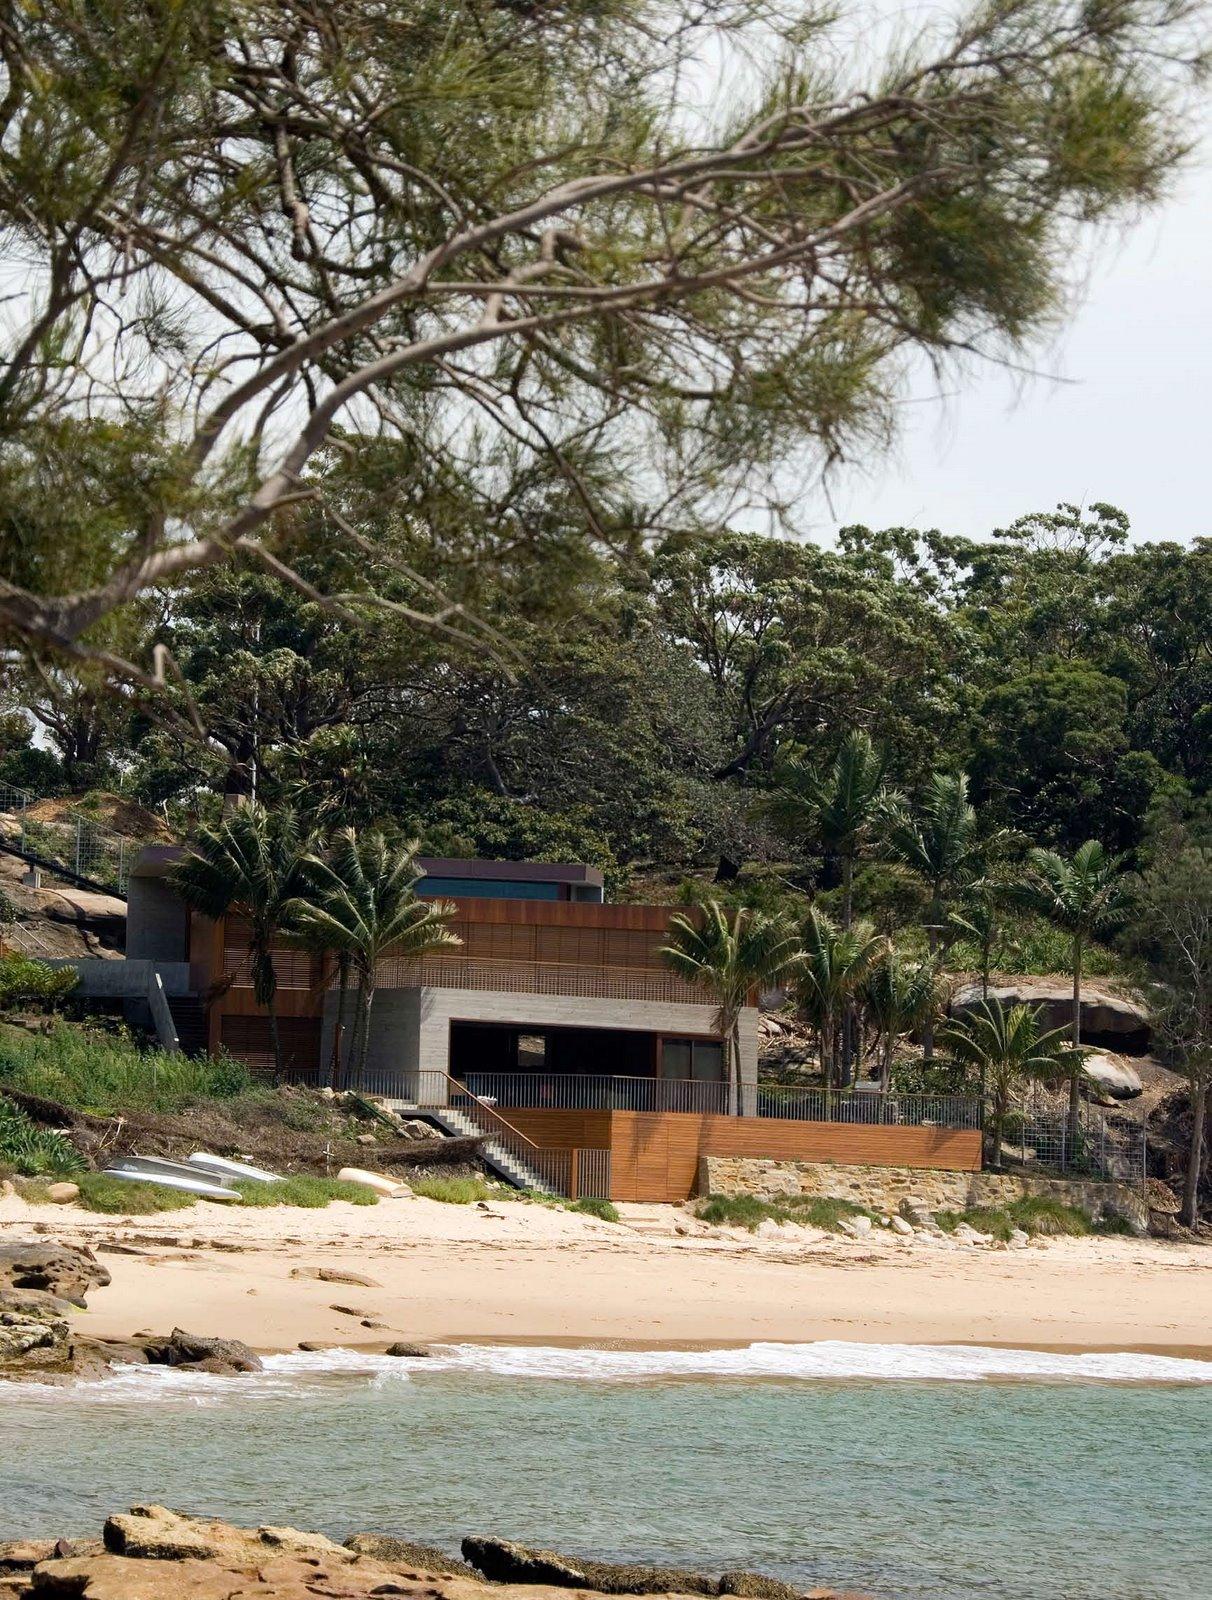 Clinton Murray S Gunyah Beach House In Bundeena Australia